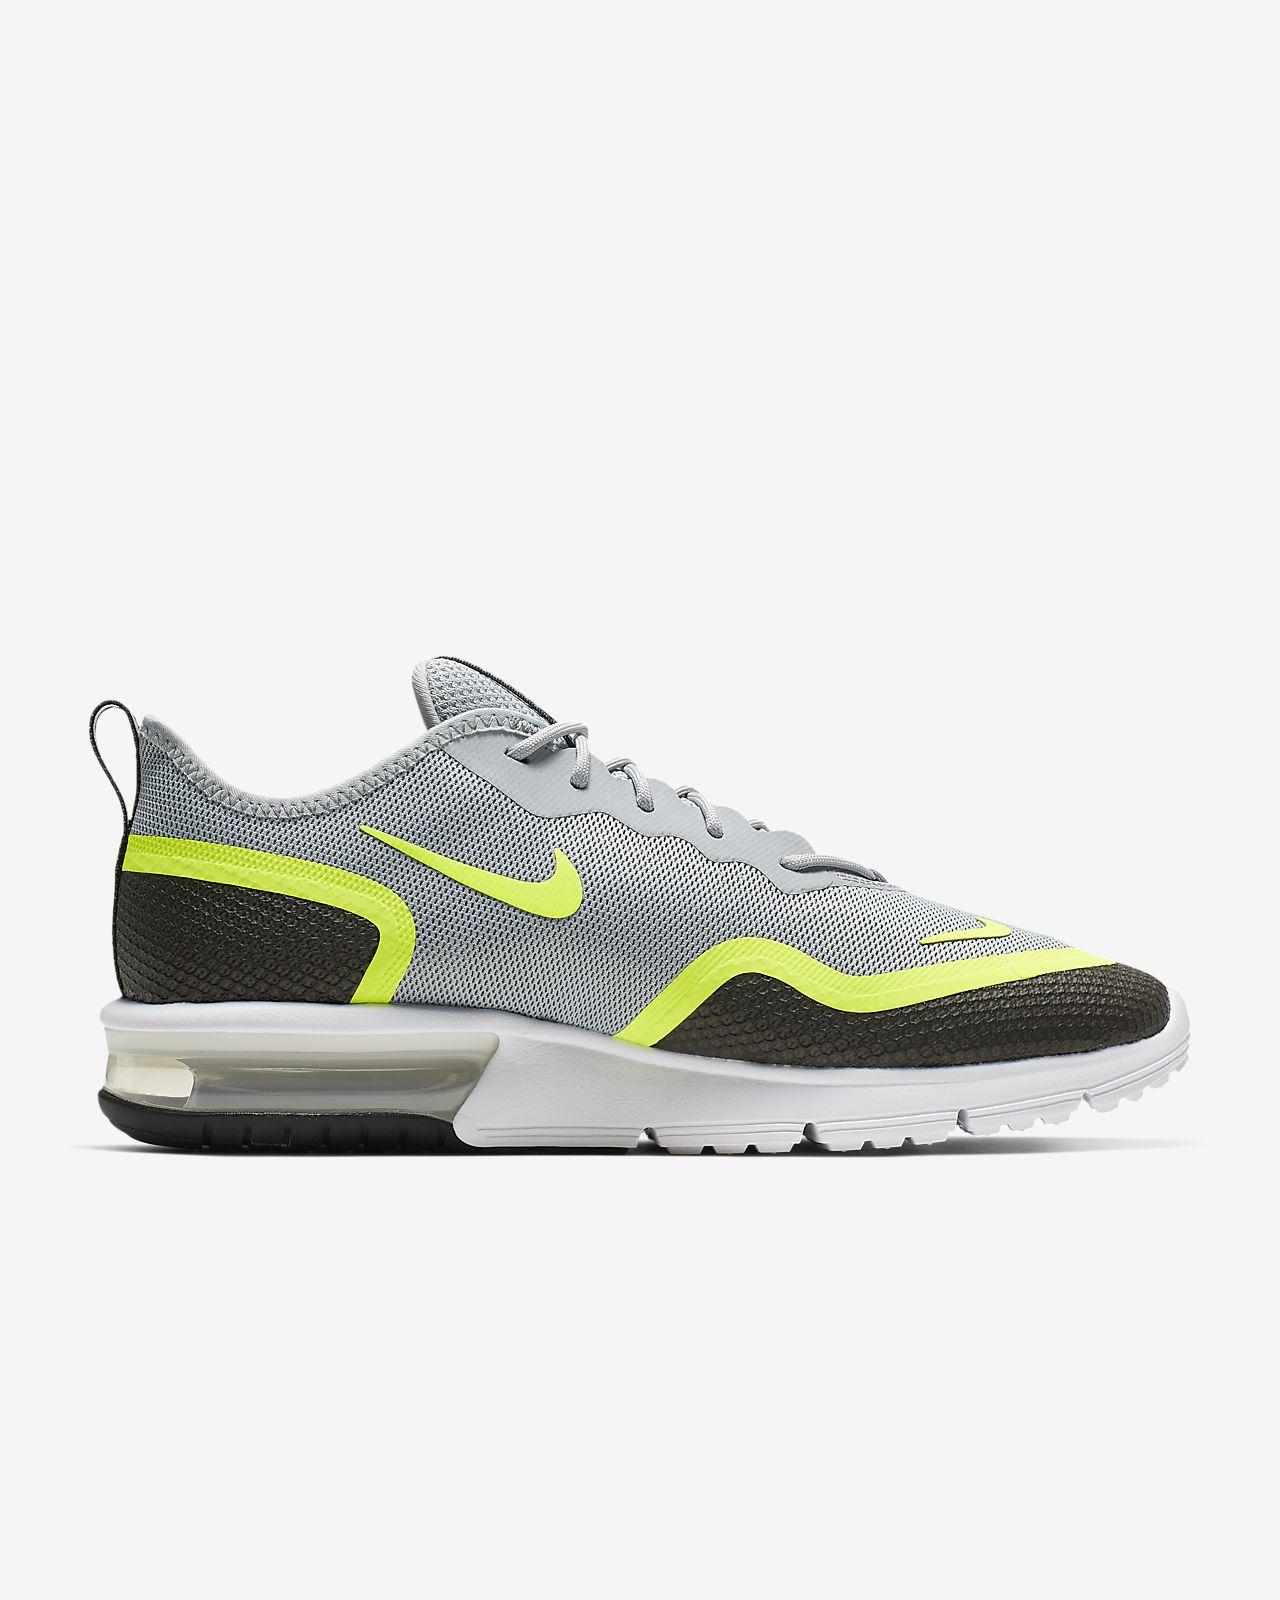 low priced eda9d 0788f ... Sko Nike Air Max Sequent 4.5 SE för män